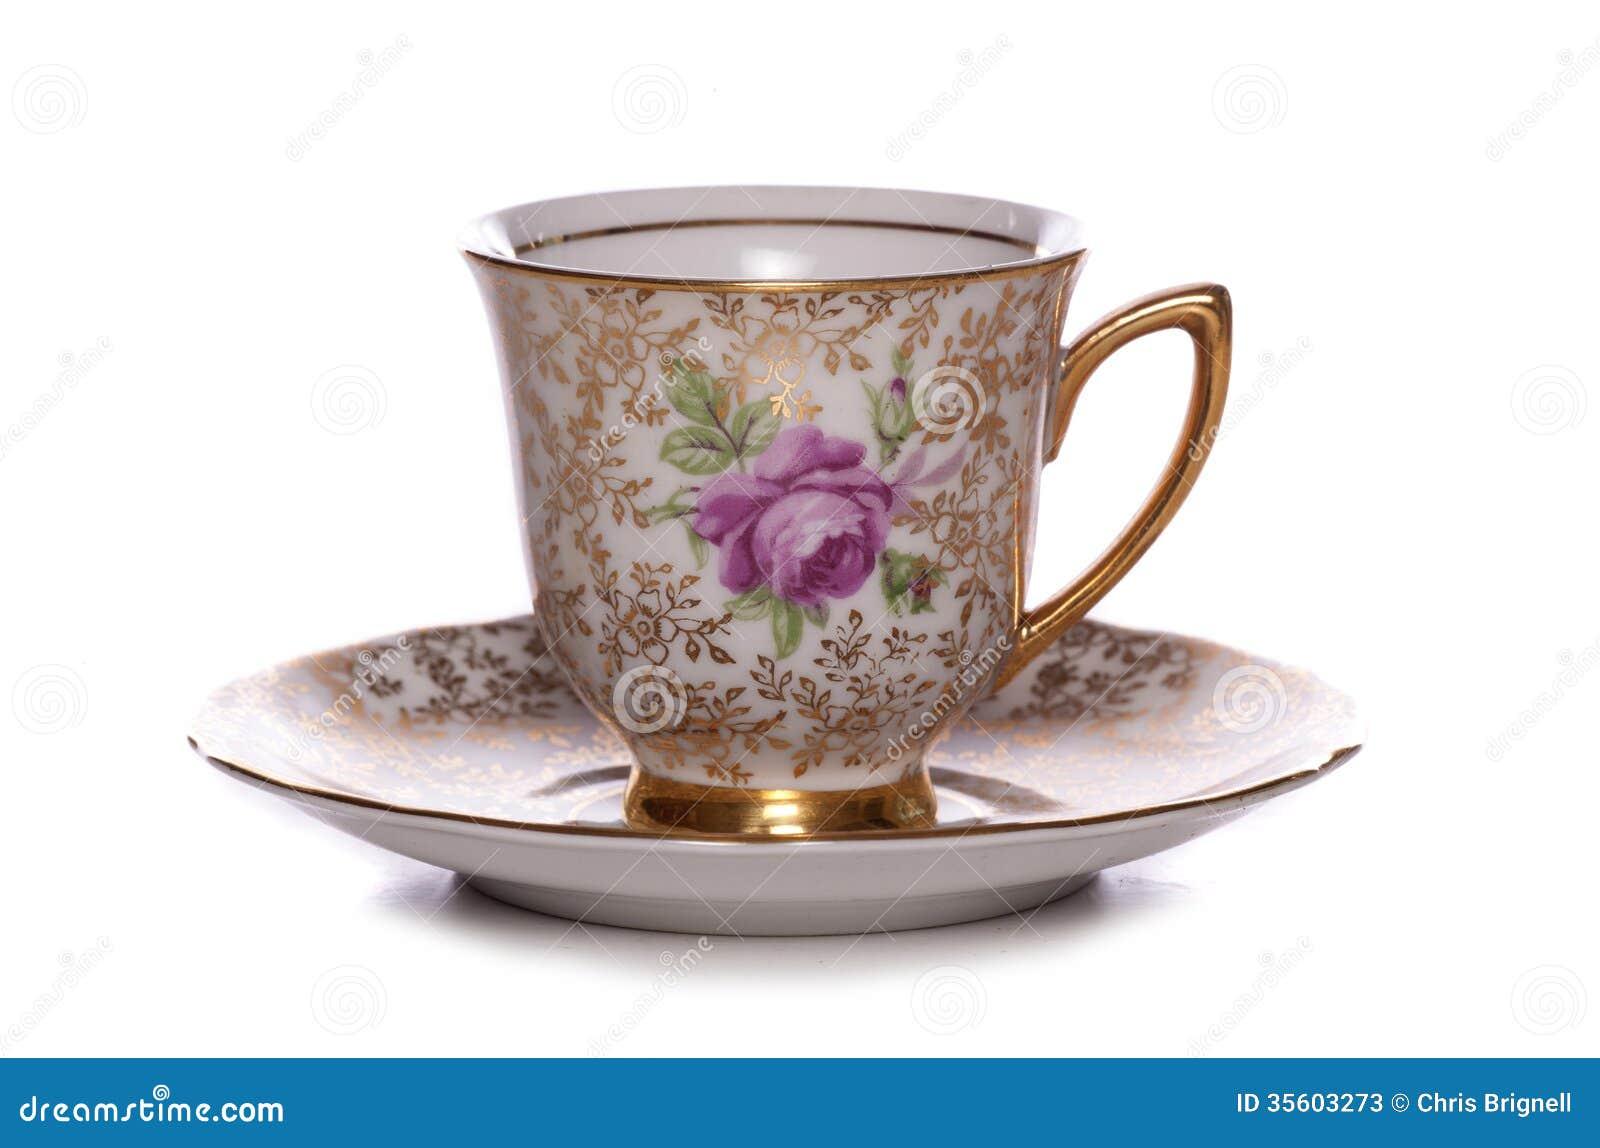 Vintage Tea Cups and Saucers, Antique China,Tea Pots